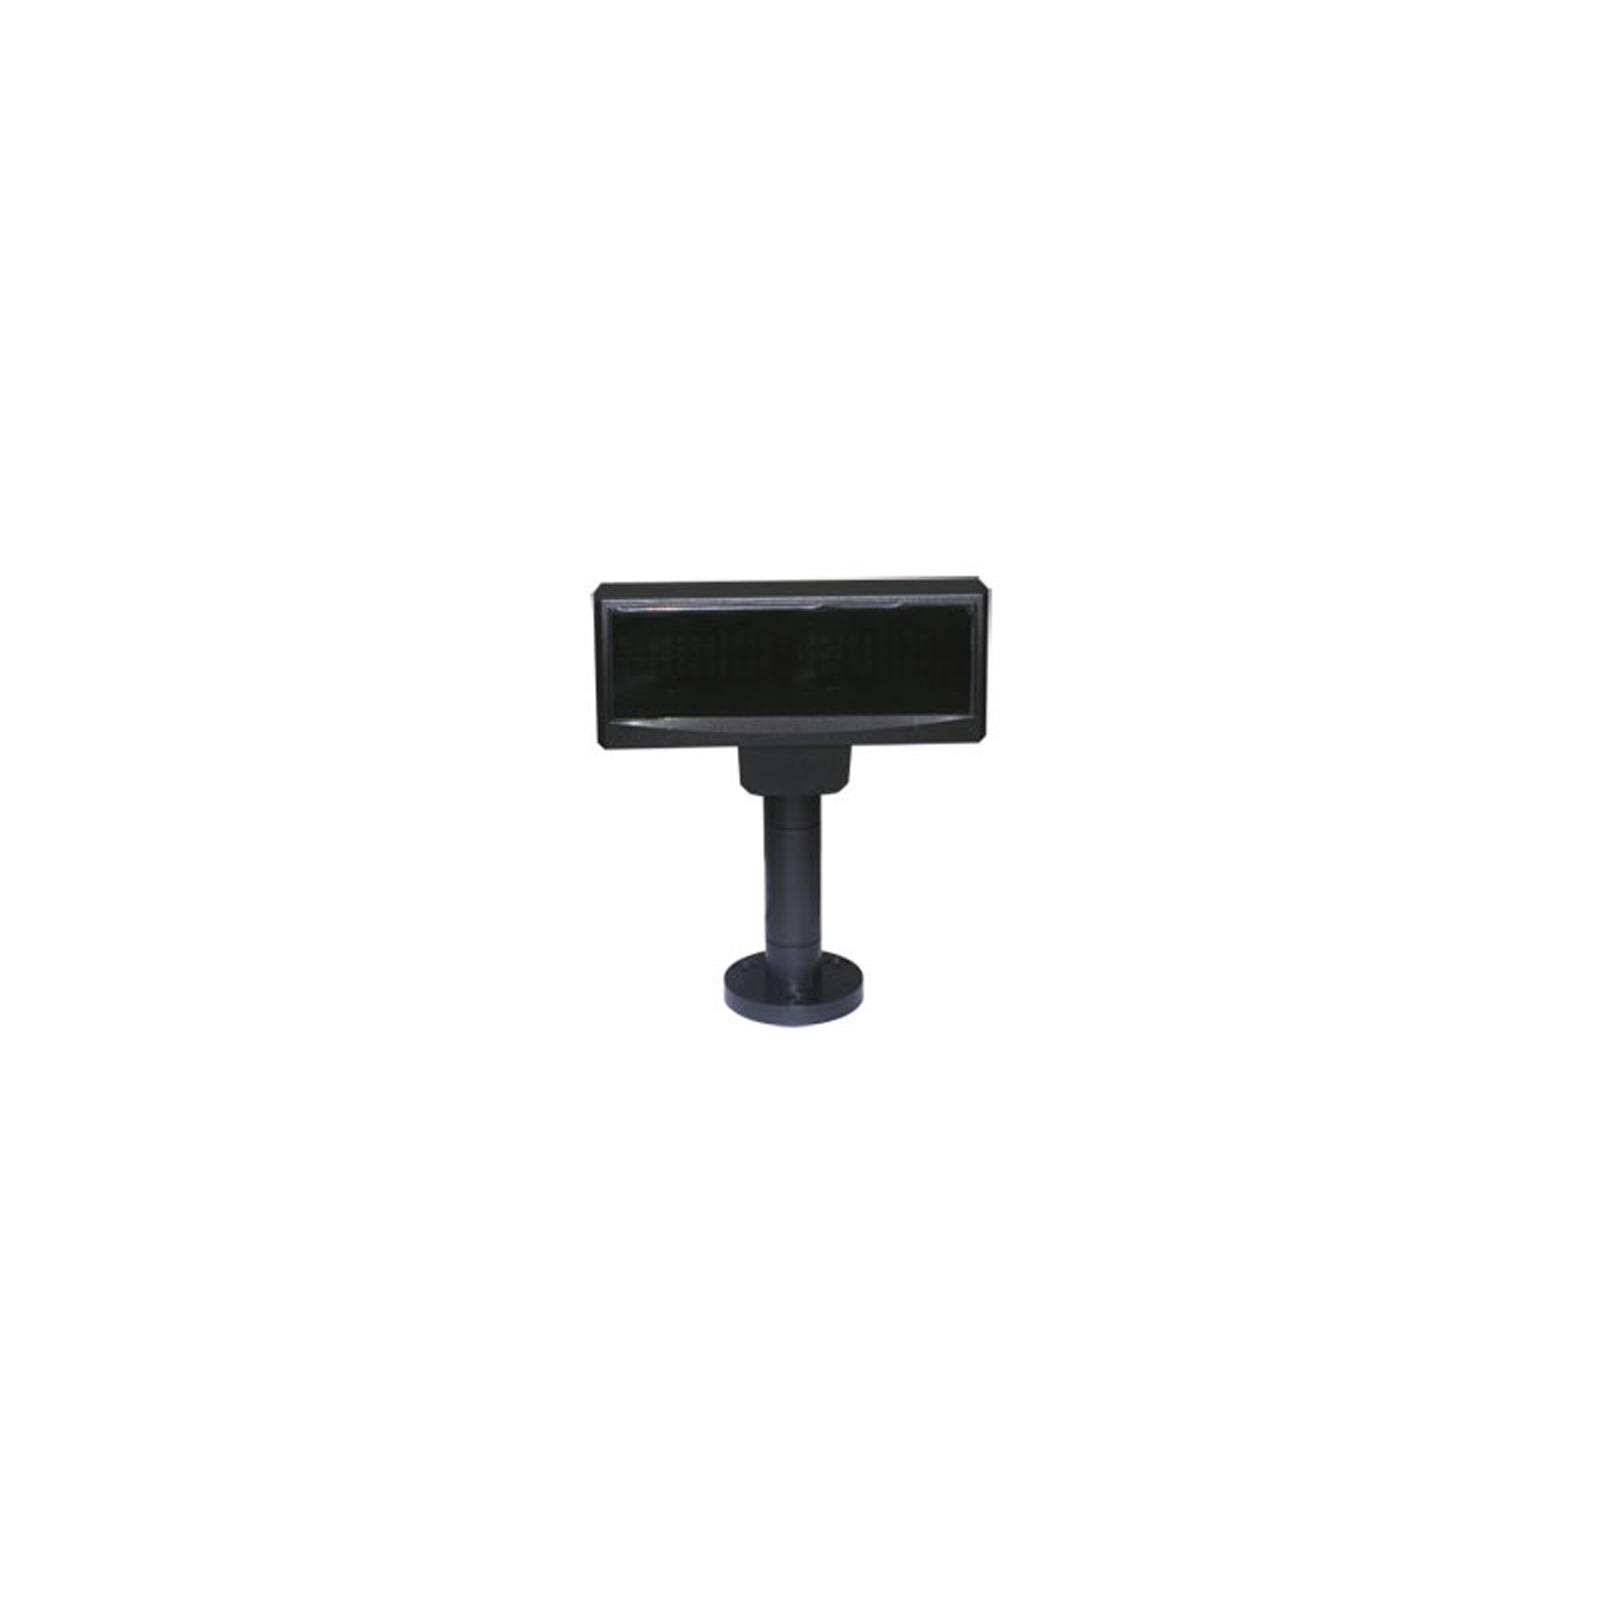 Индикатор покупателя ICS-Tech MG-2x20